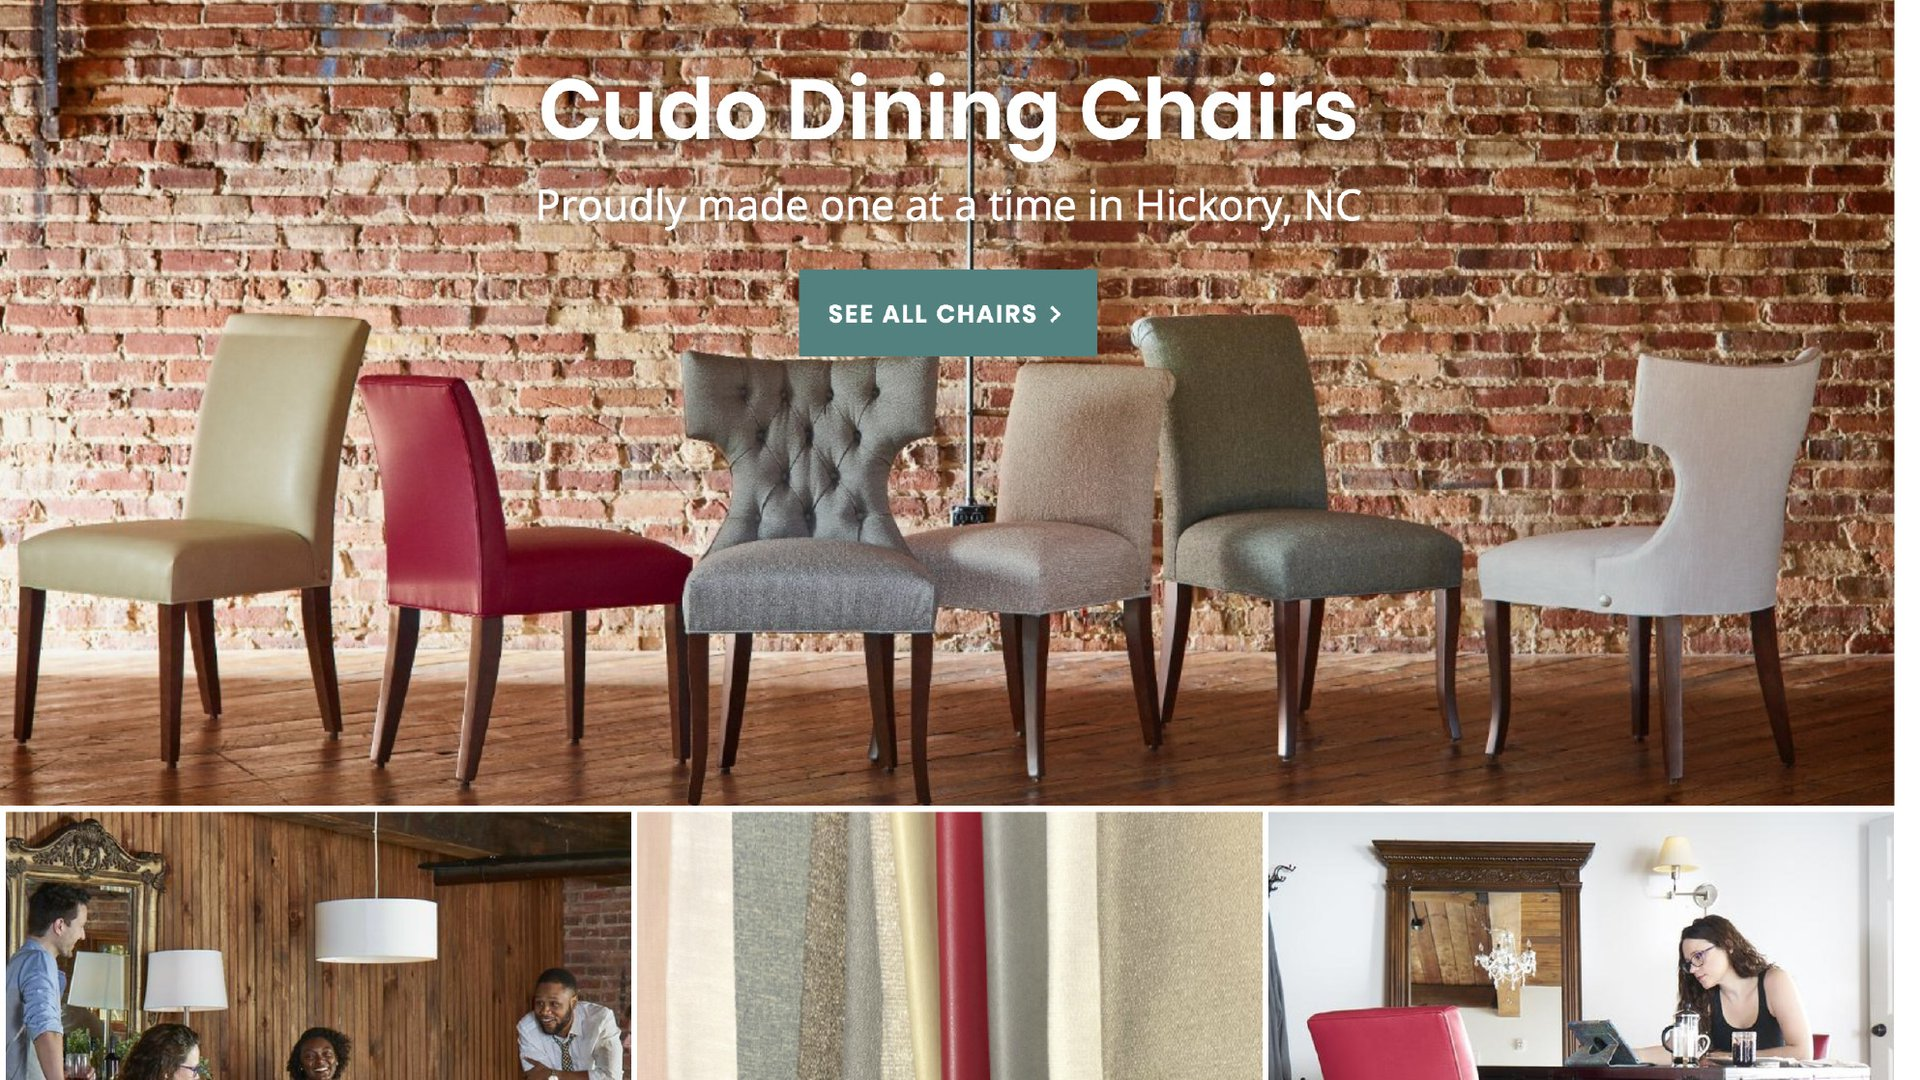 VanNoppen Marketing Creates CudoChairs.com for e-commerce